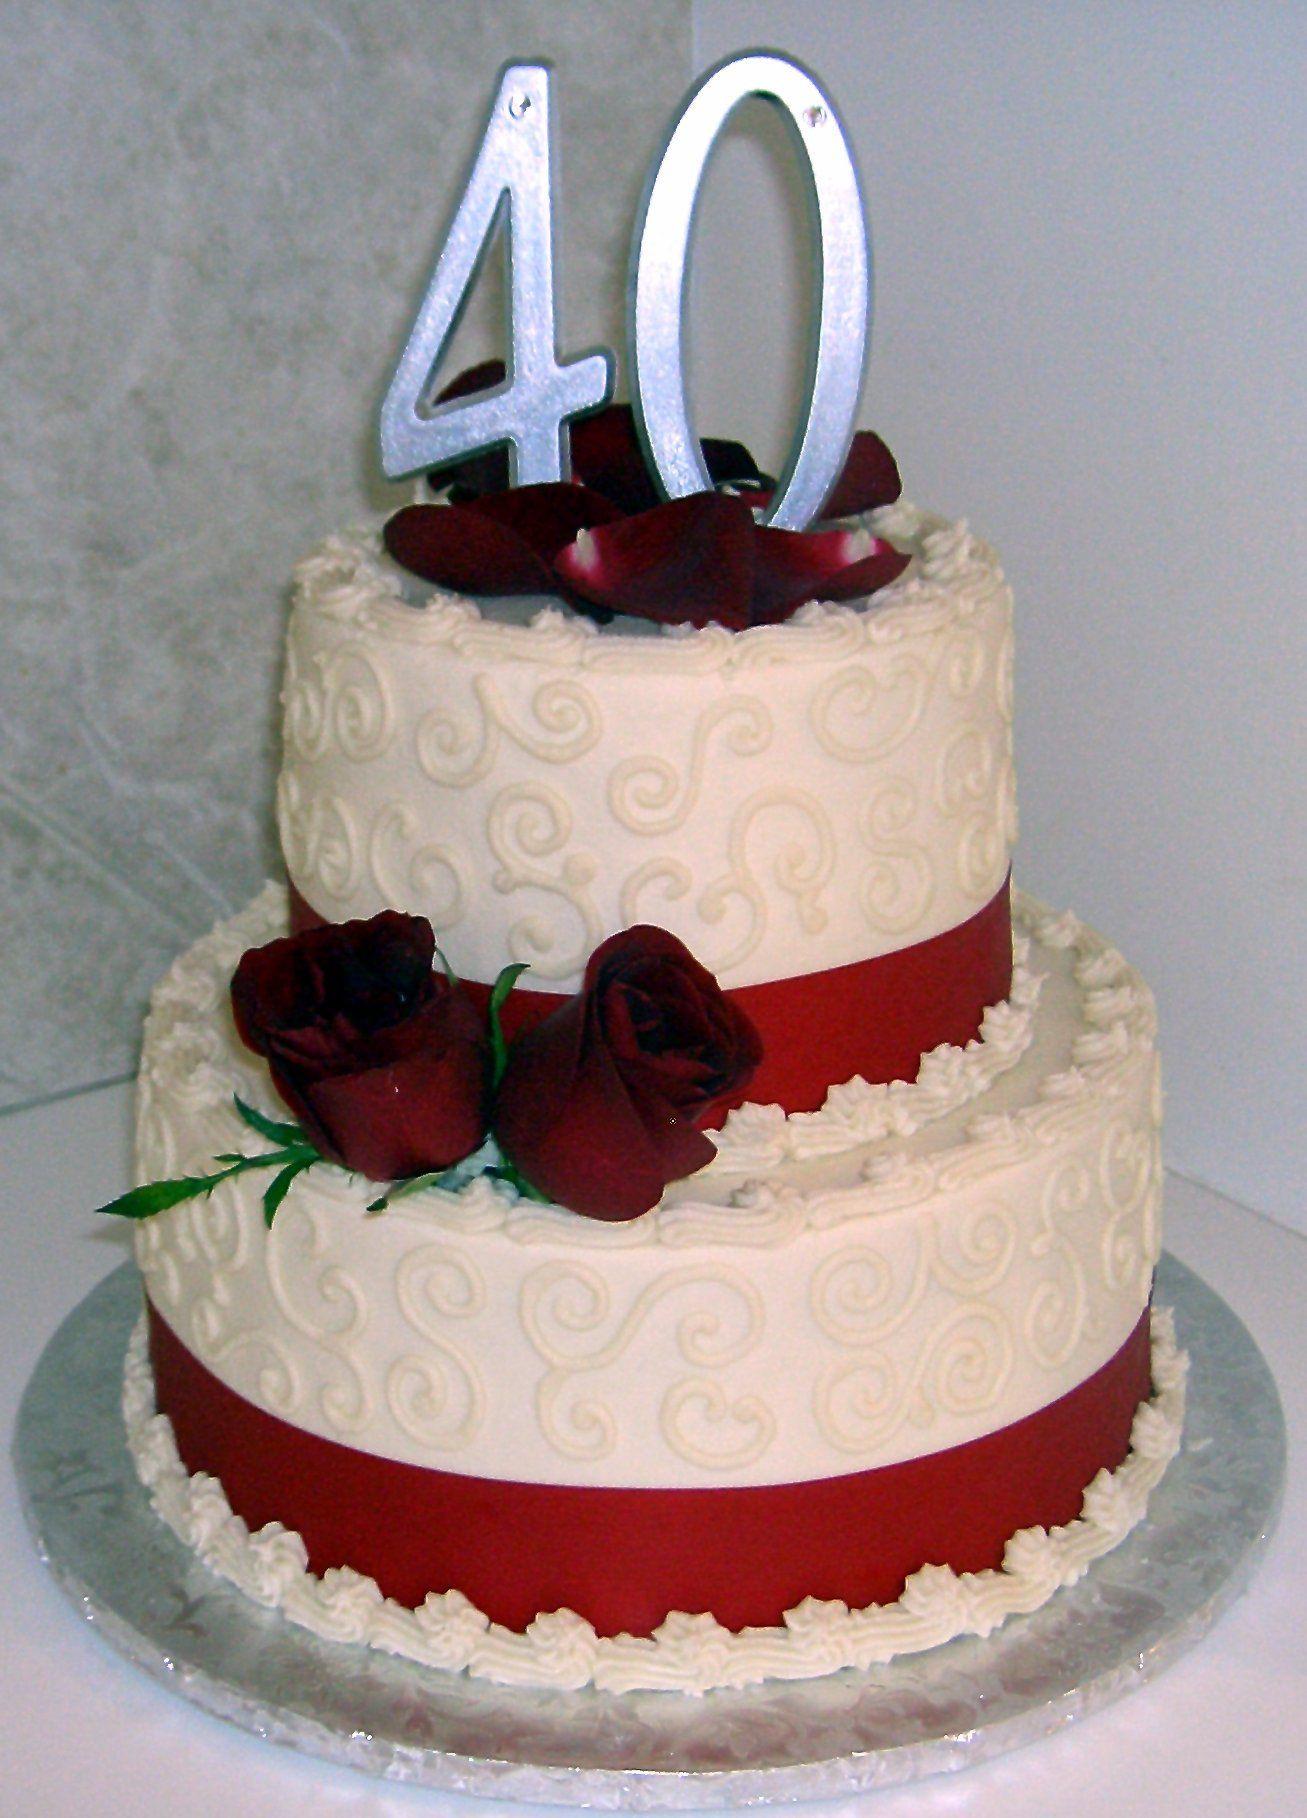 40Th Wedding Anniversary Cakes  40th Wedding Anniversary Cakes